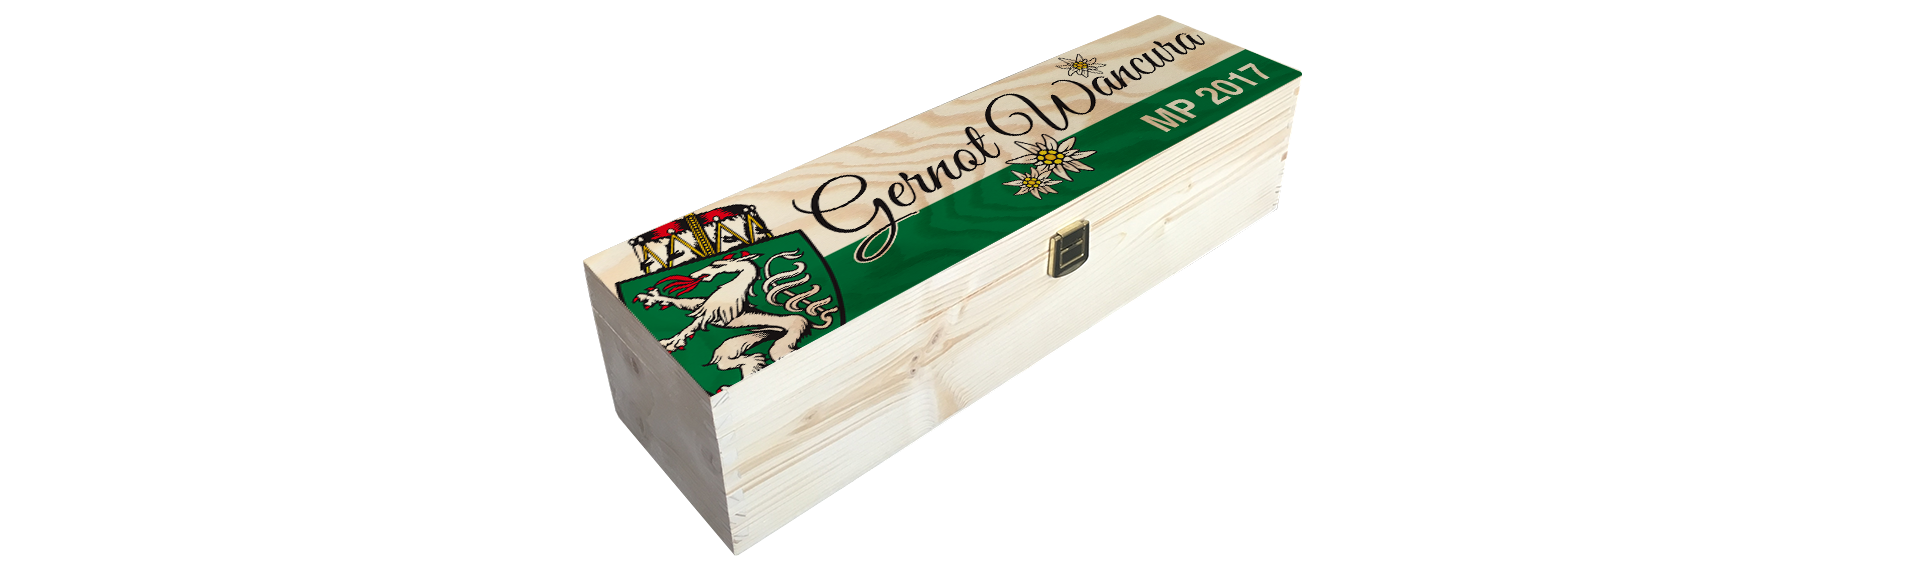 Wancura | Holzkiste Weinkiste  bedruckt